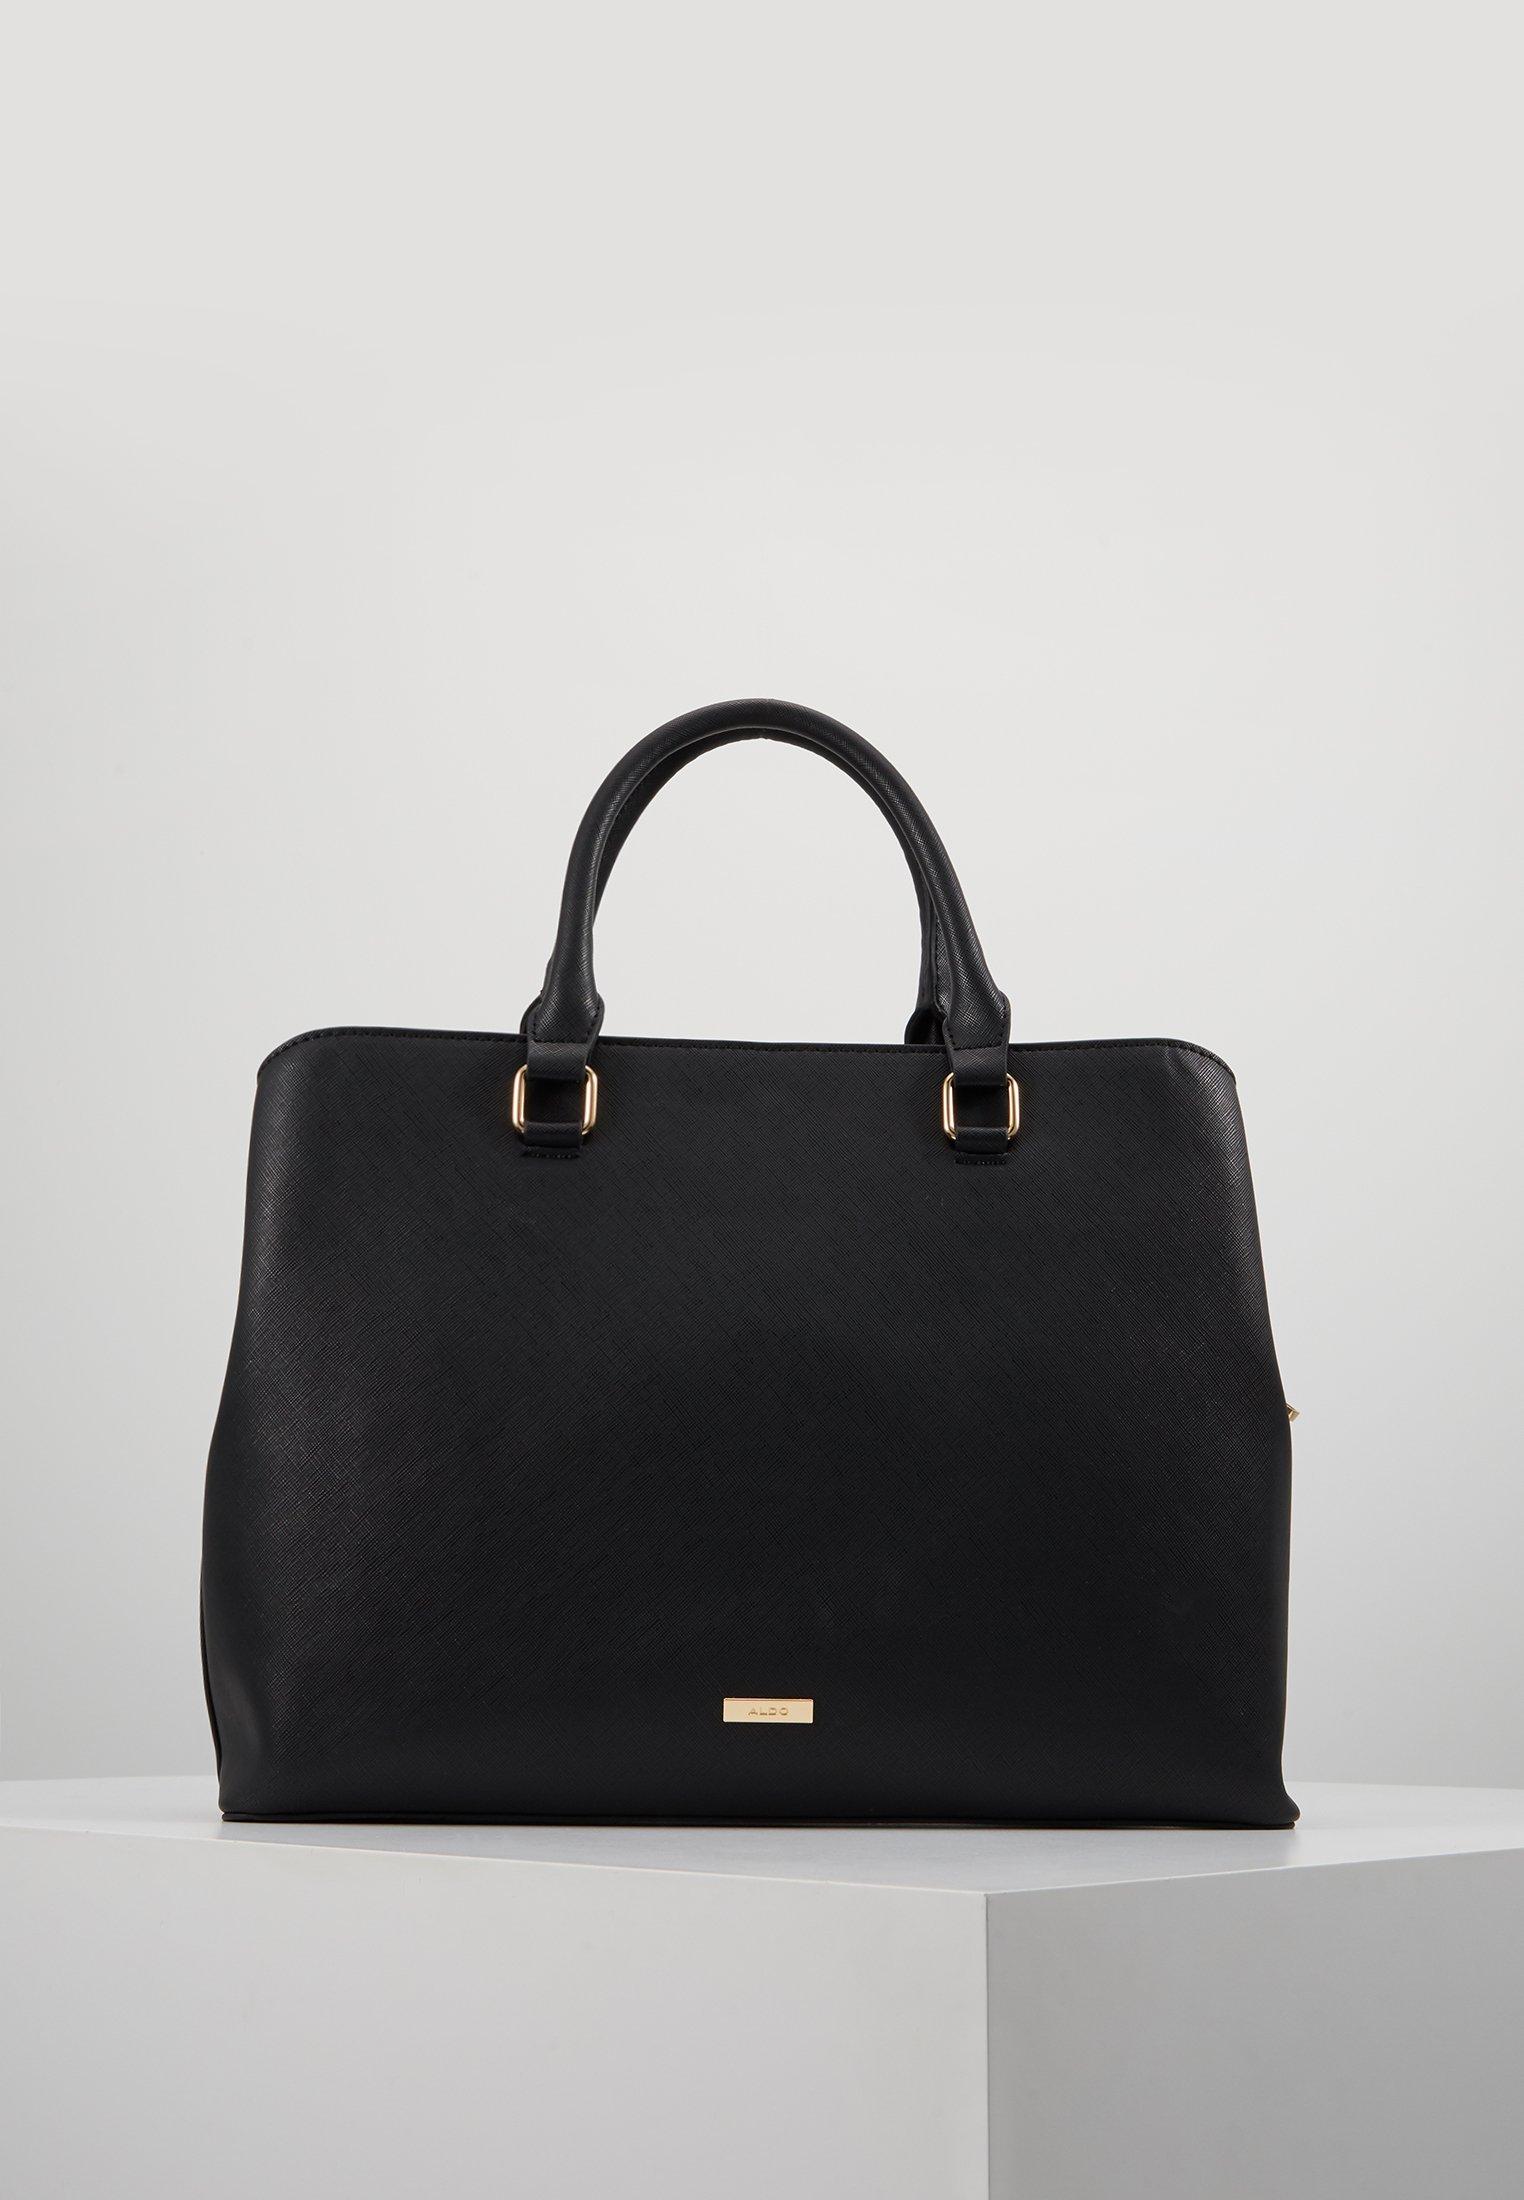 Fashion Style Best Place Accessories ALDO SIGOSSA Handbag black 1fCtCAyoZ 1bsCRiaM3